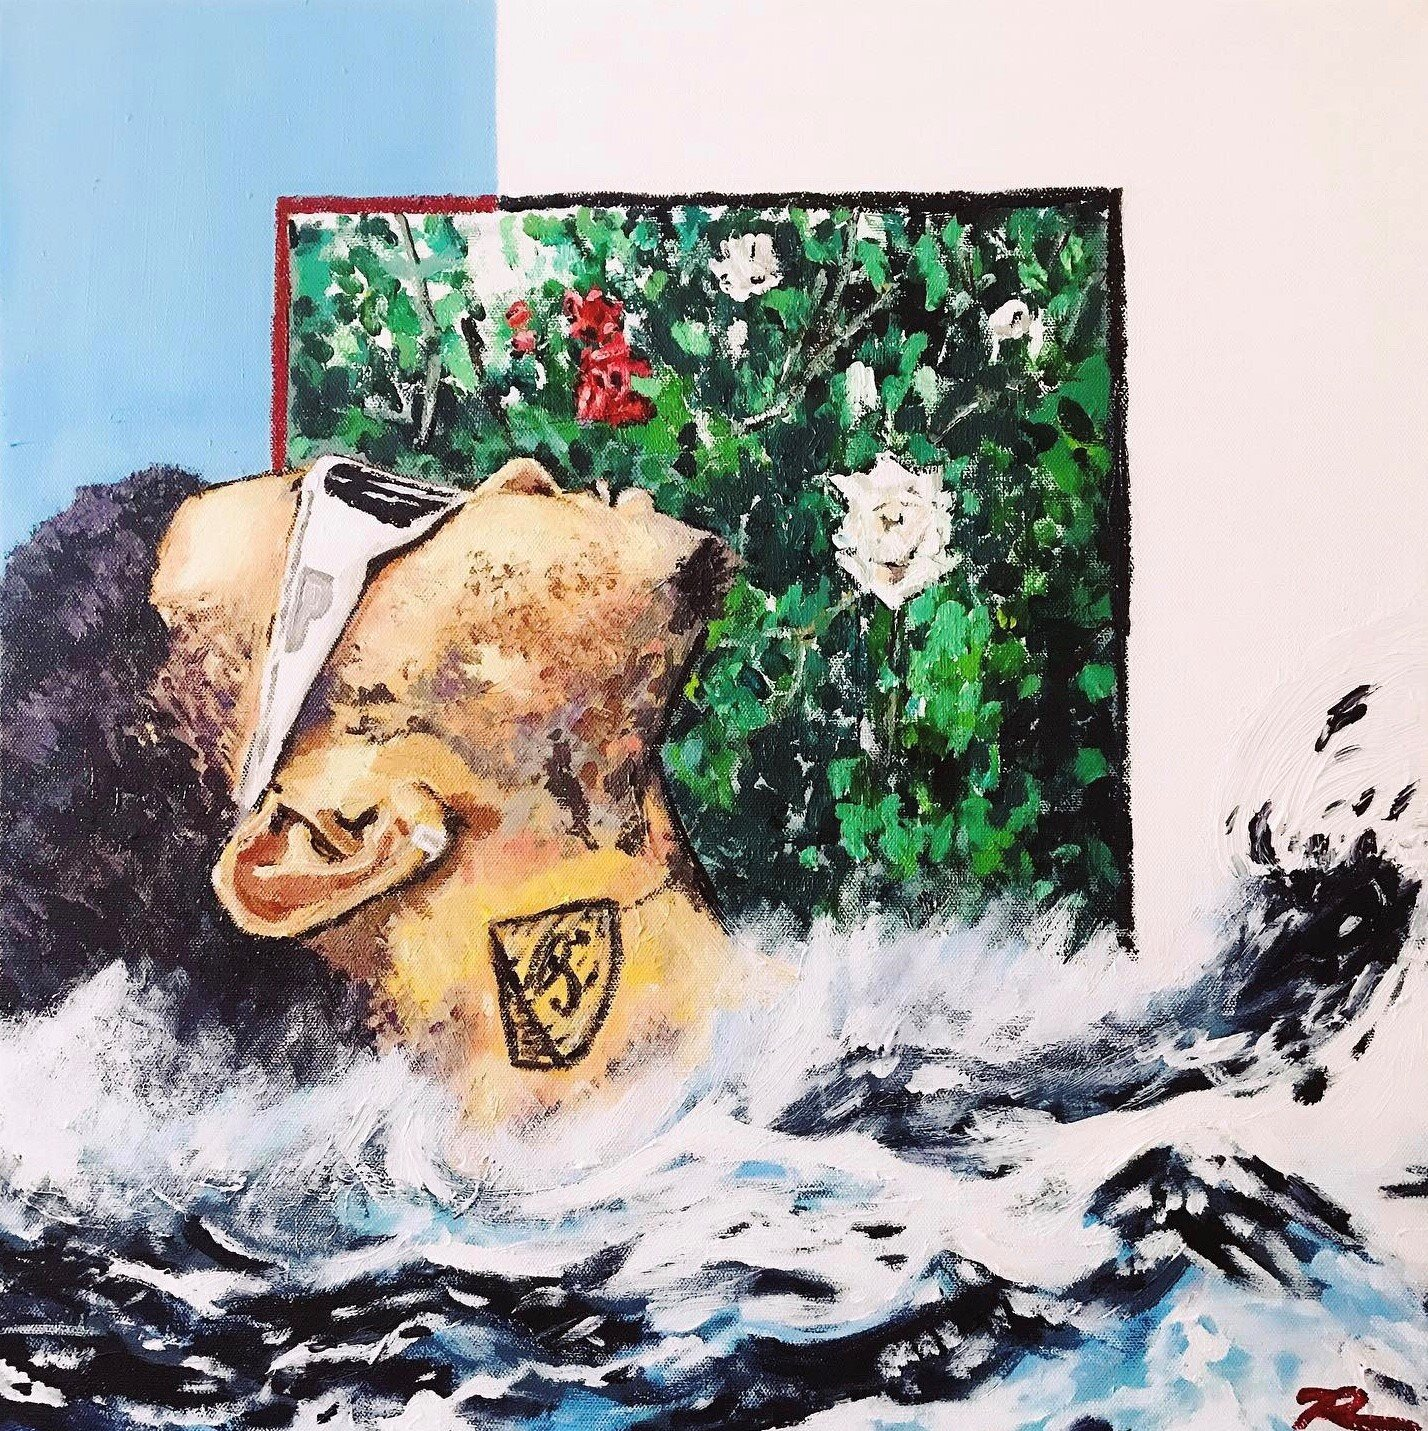 SoulsIVRansom - 24x24 Acrylic on Canvas.